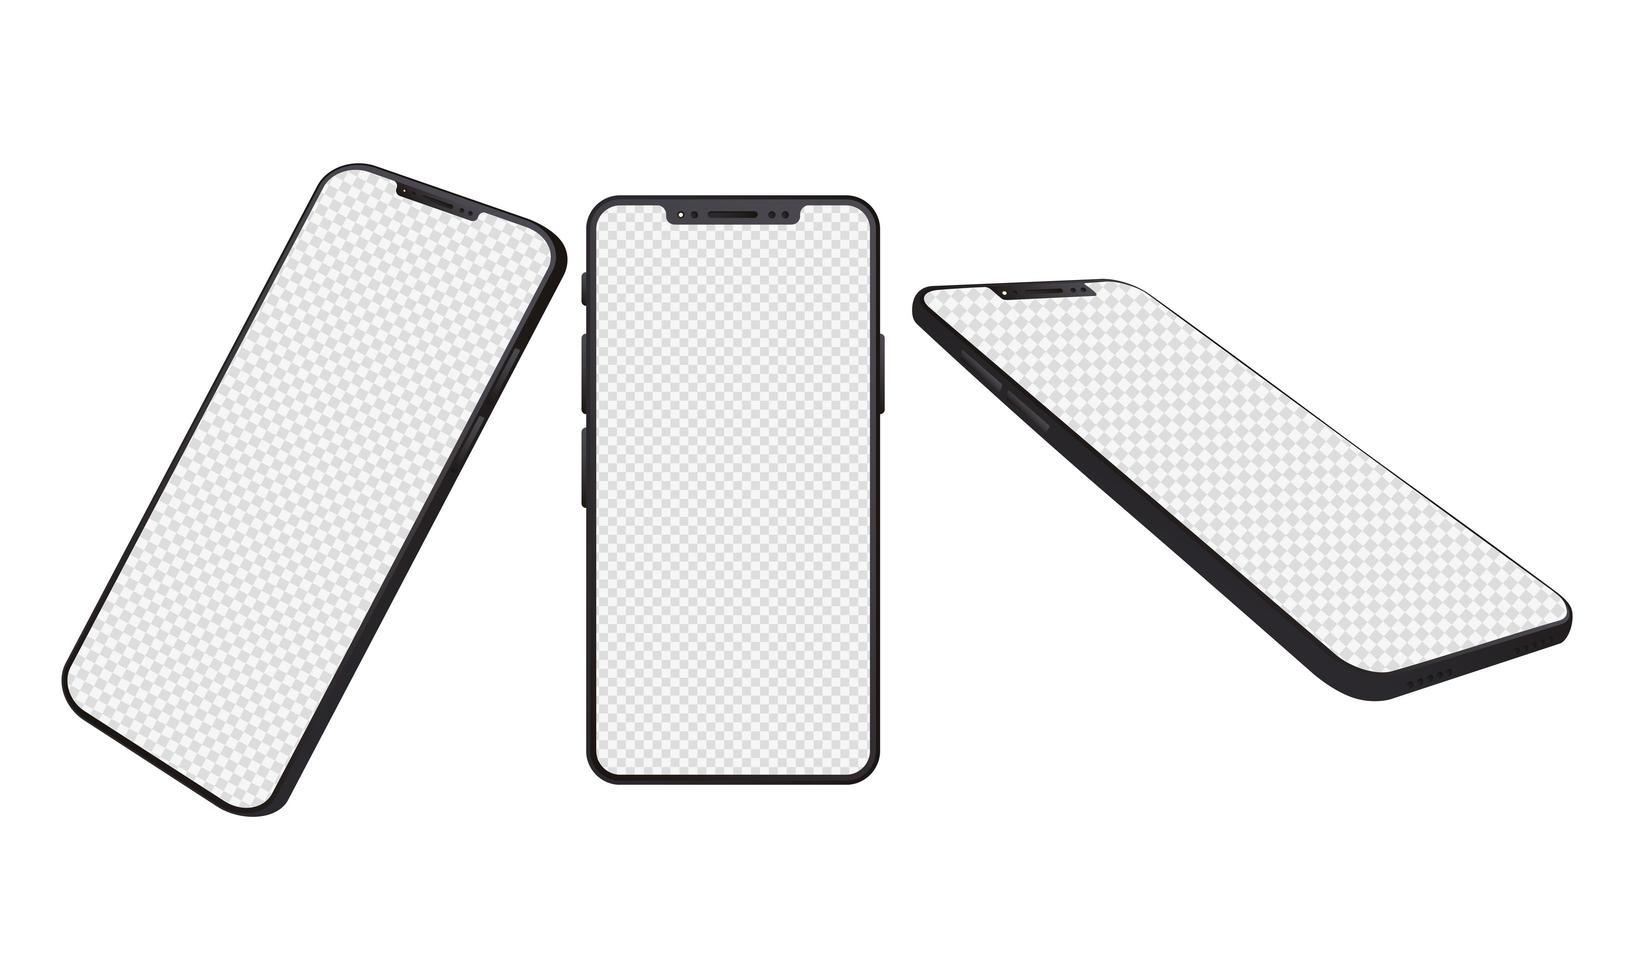 vanliga smartphone-mock-up-enheter vektor